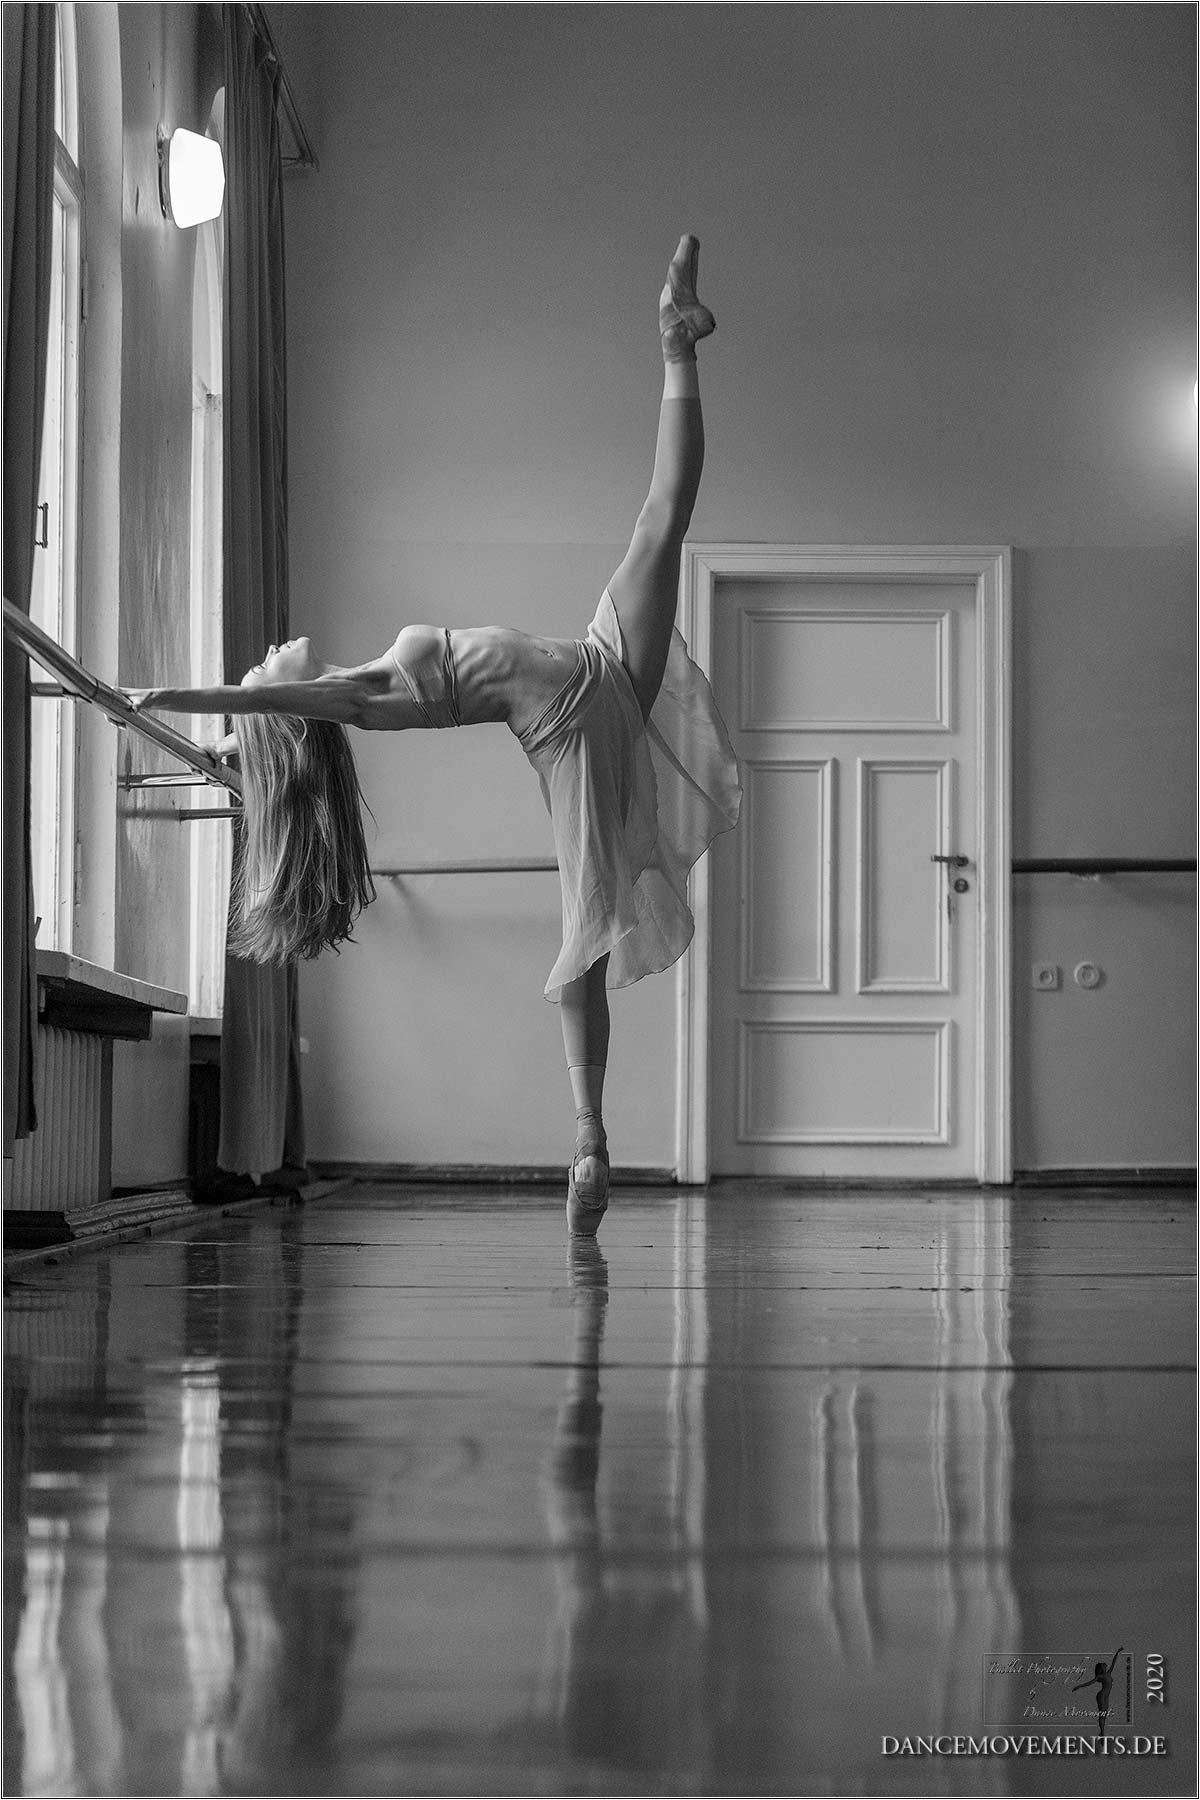 Julia-Moskalenko-2017-09-02_4014-bw